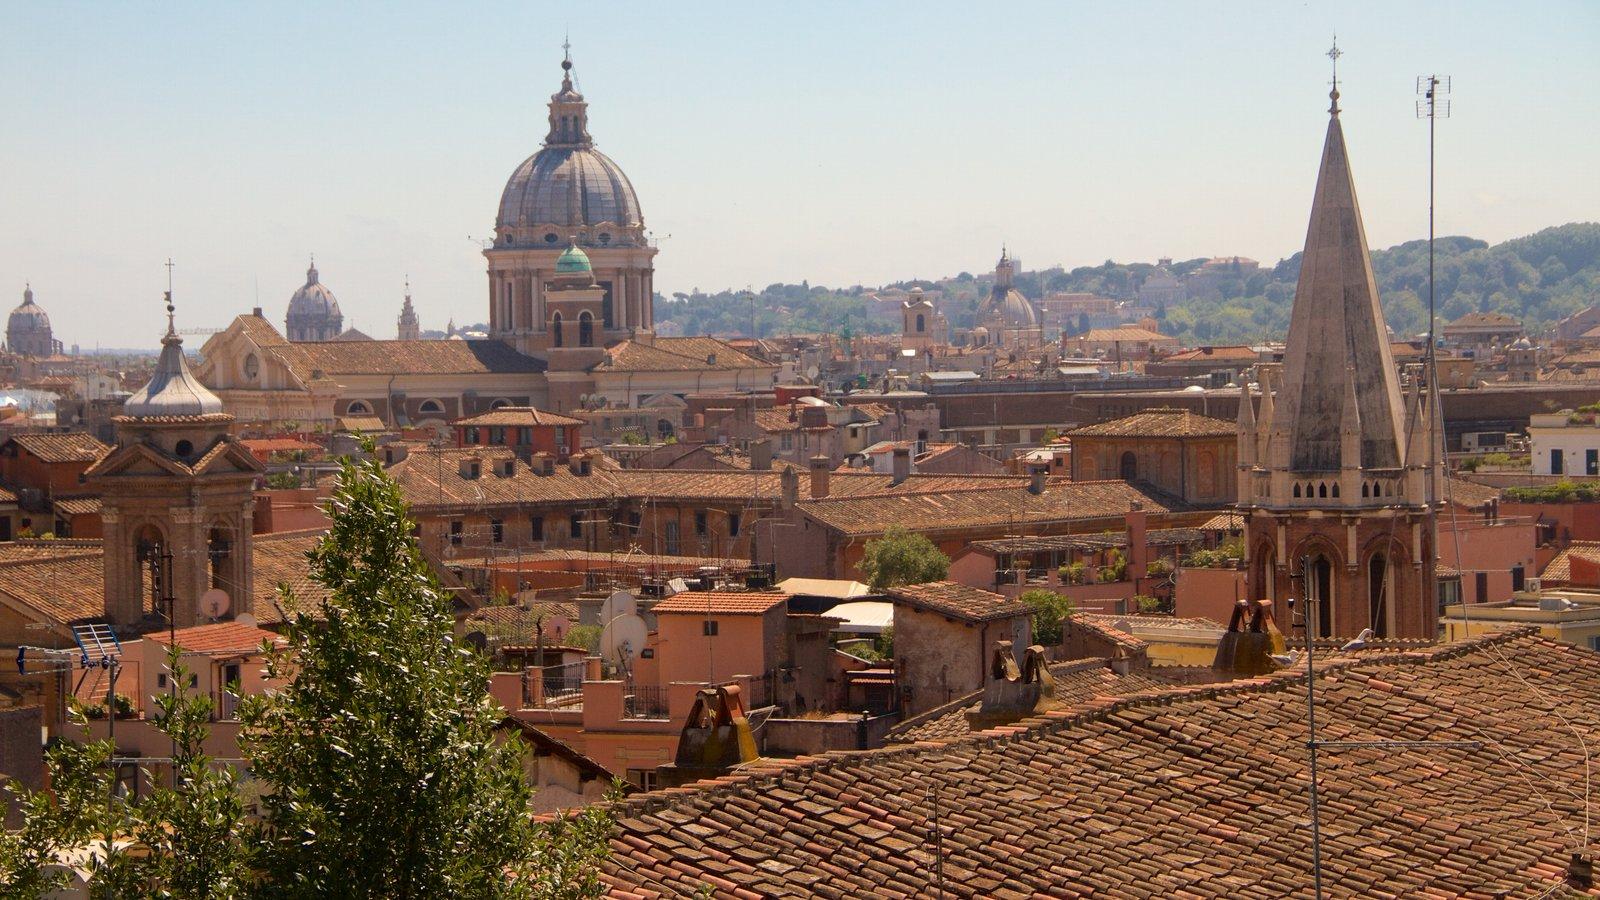 Pincio featuring a city